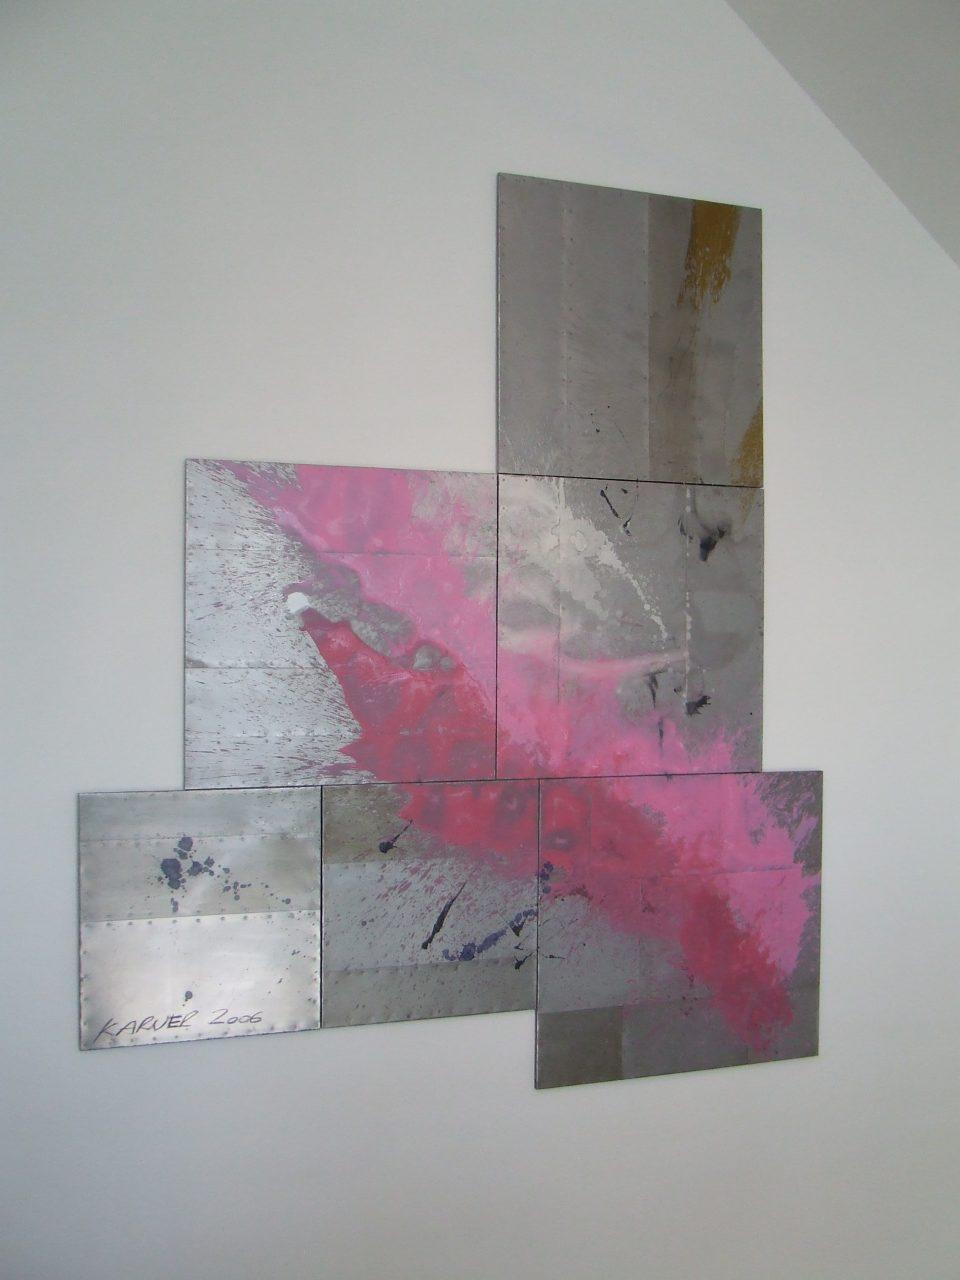 projekt landegger, mischtechnik, öl auf metall, 397x331cm, 2006, 01